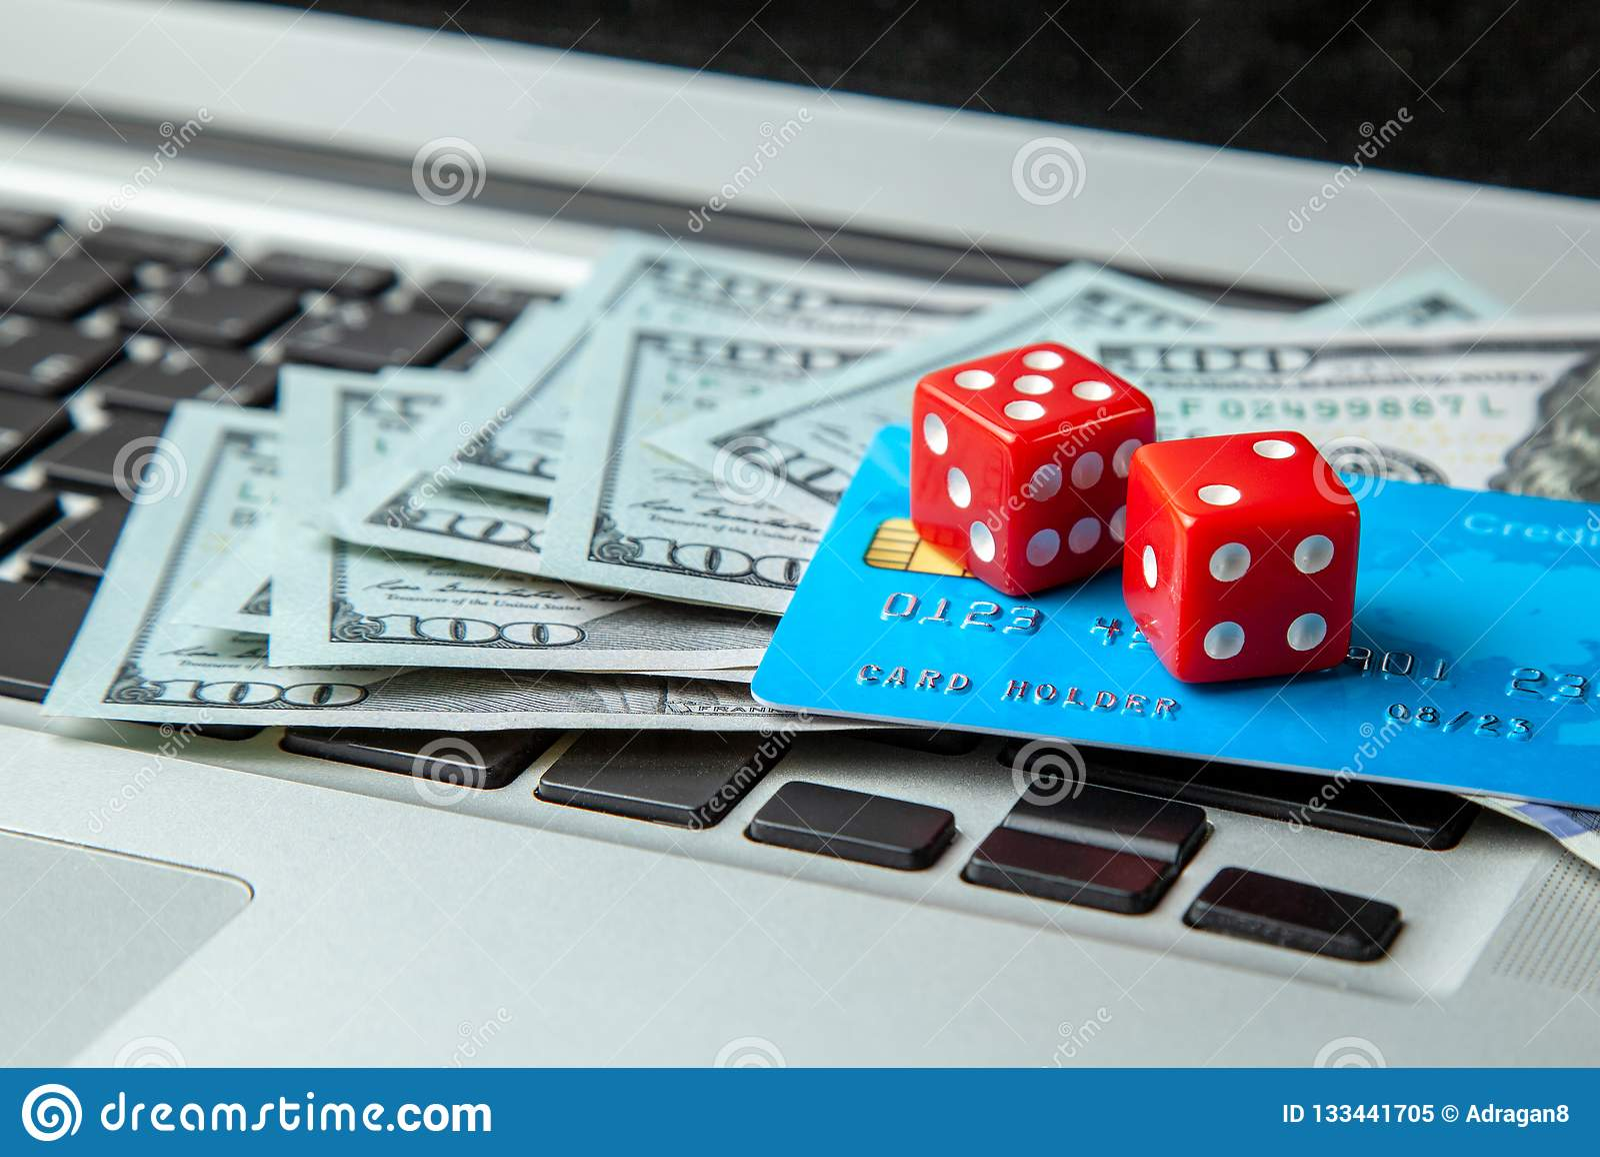 Казино онлайн играть на доллары казино нирвана азов сити онлайн